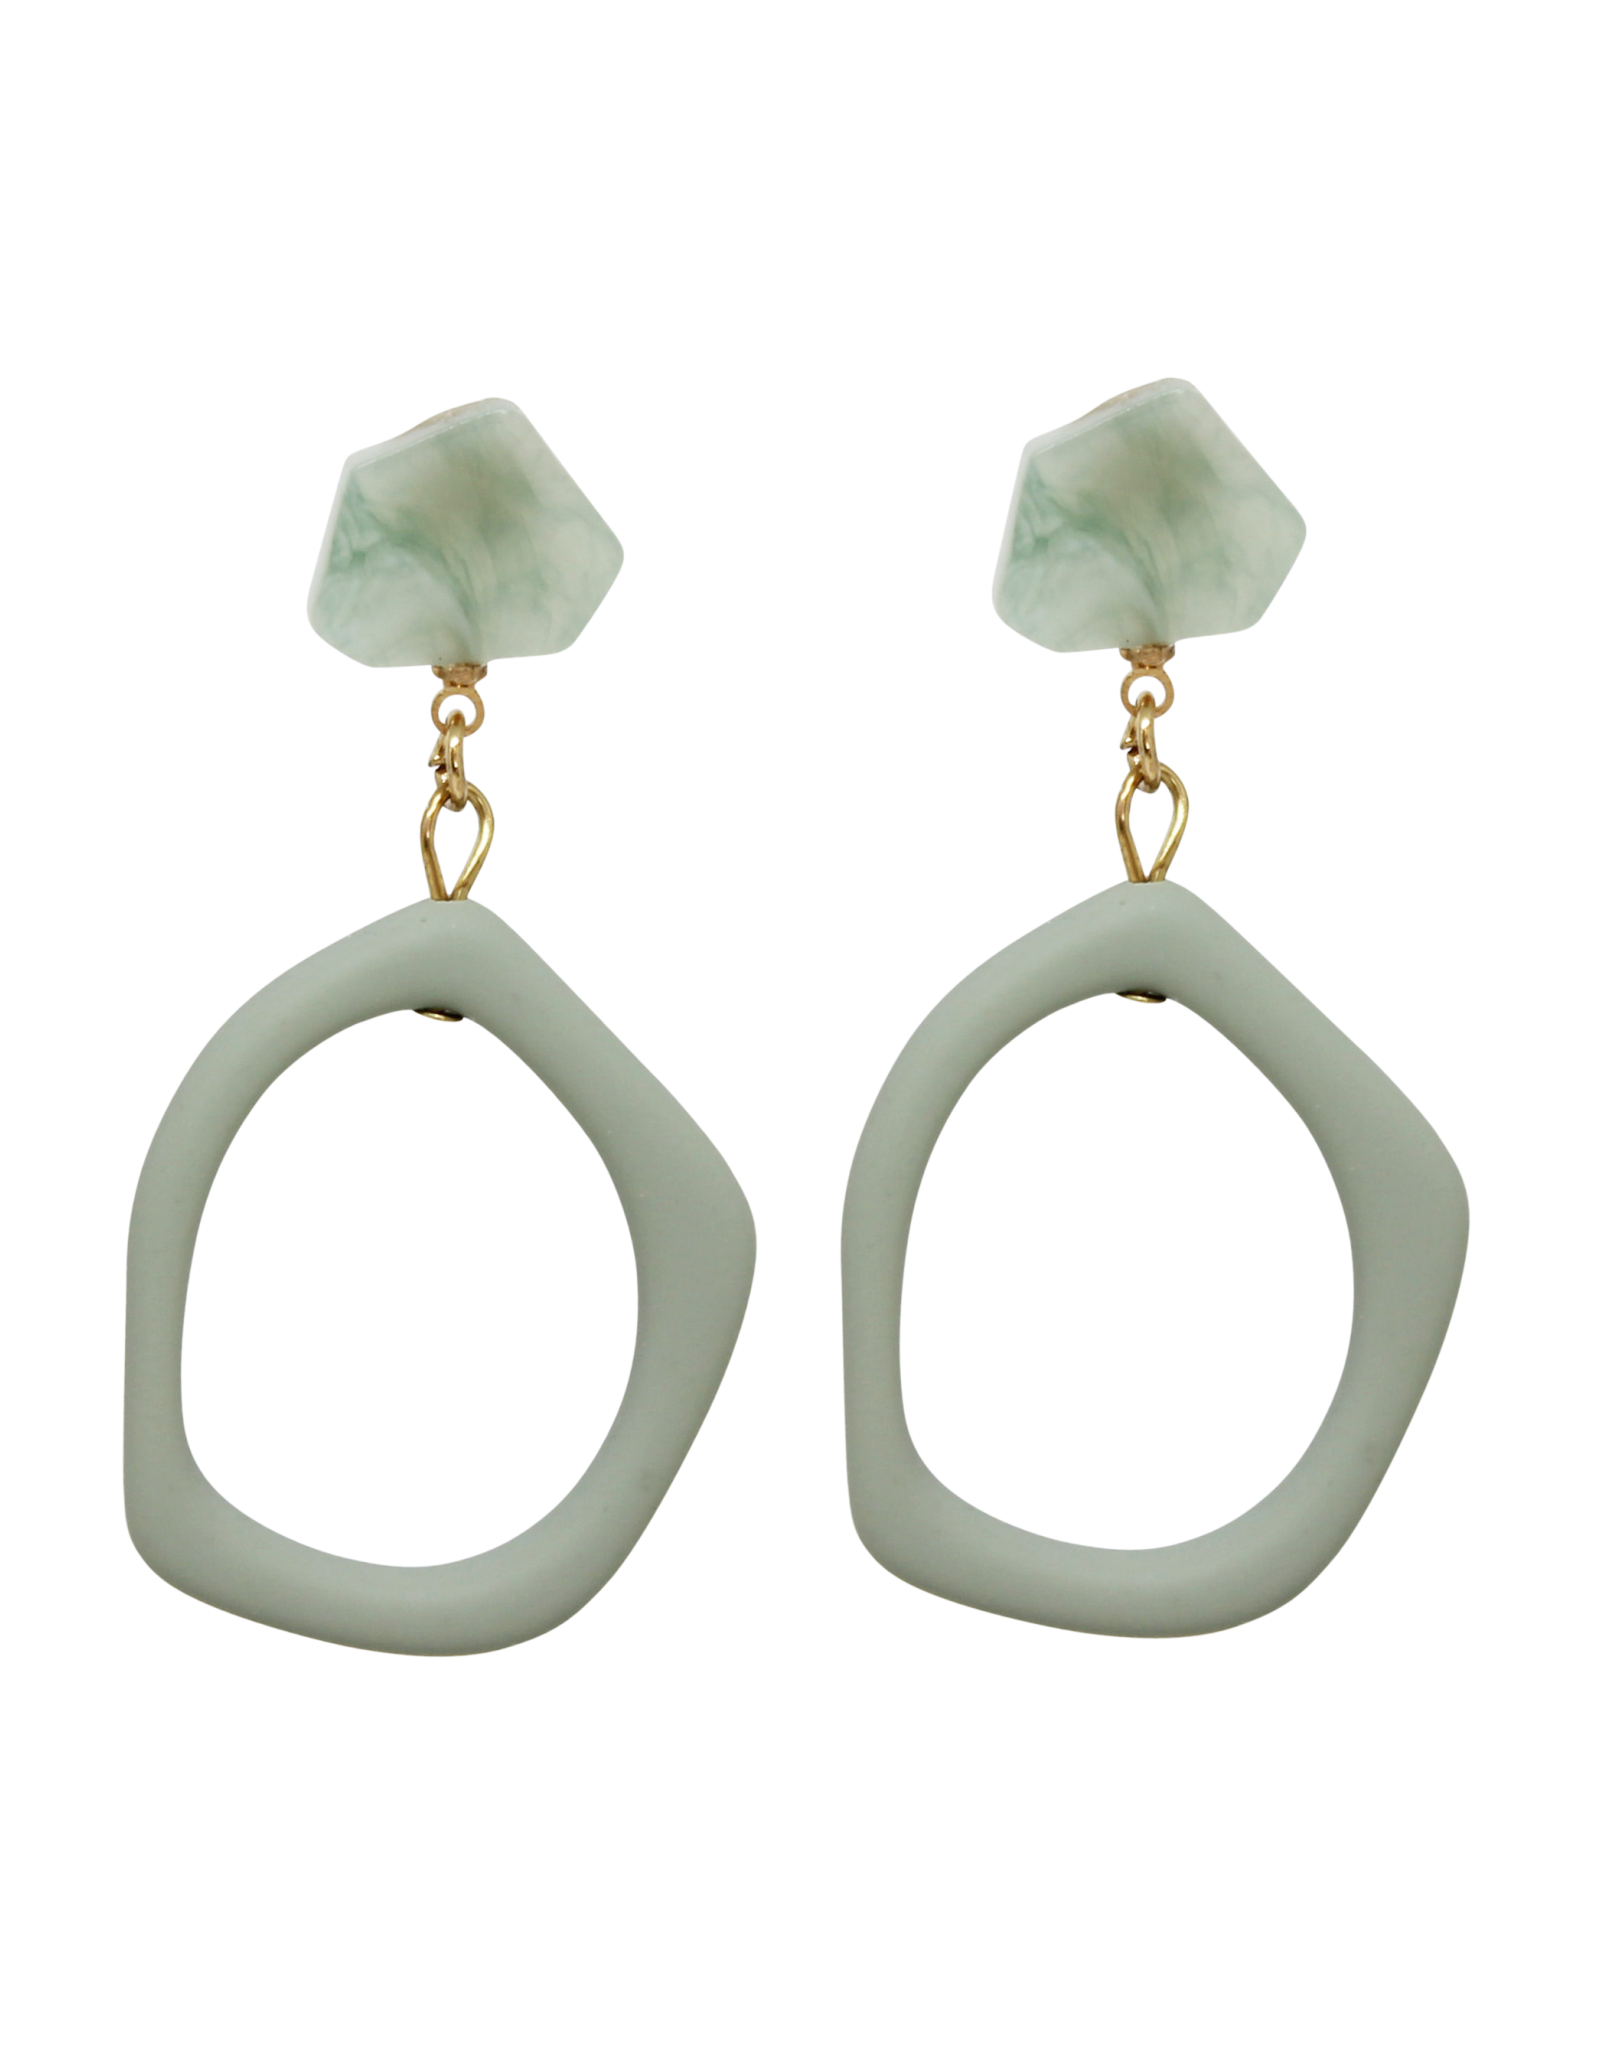 Vayu Jewels Grecia Earrings - Sage